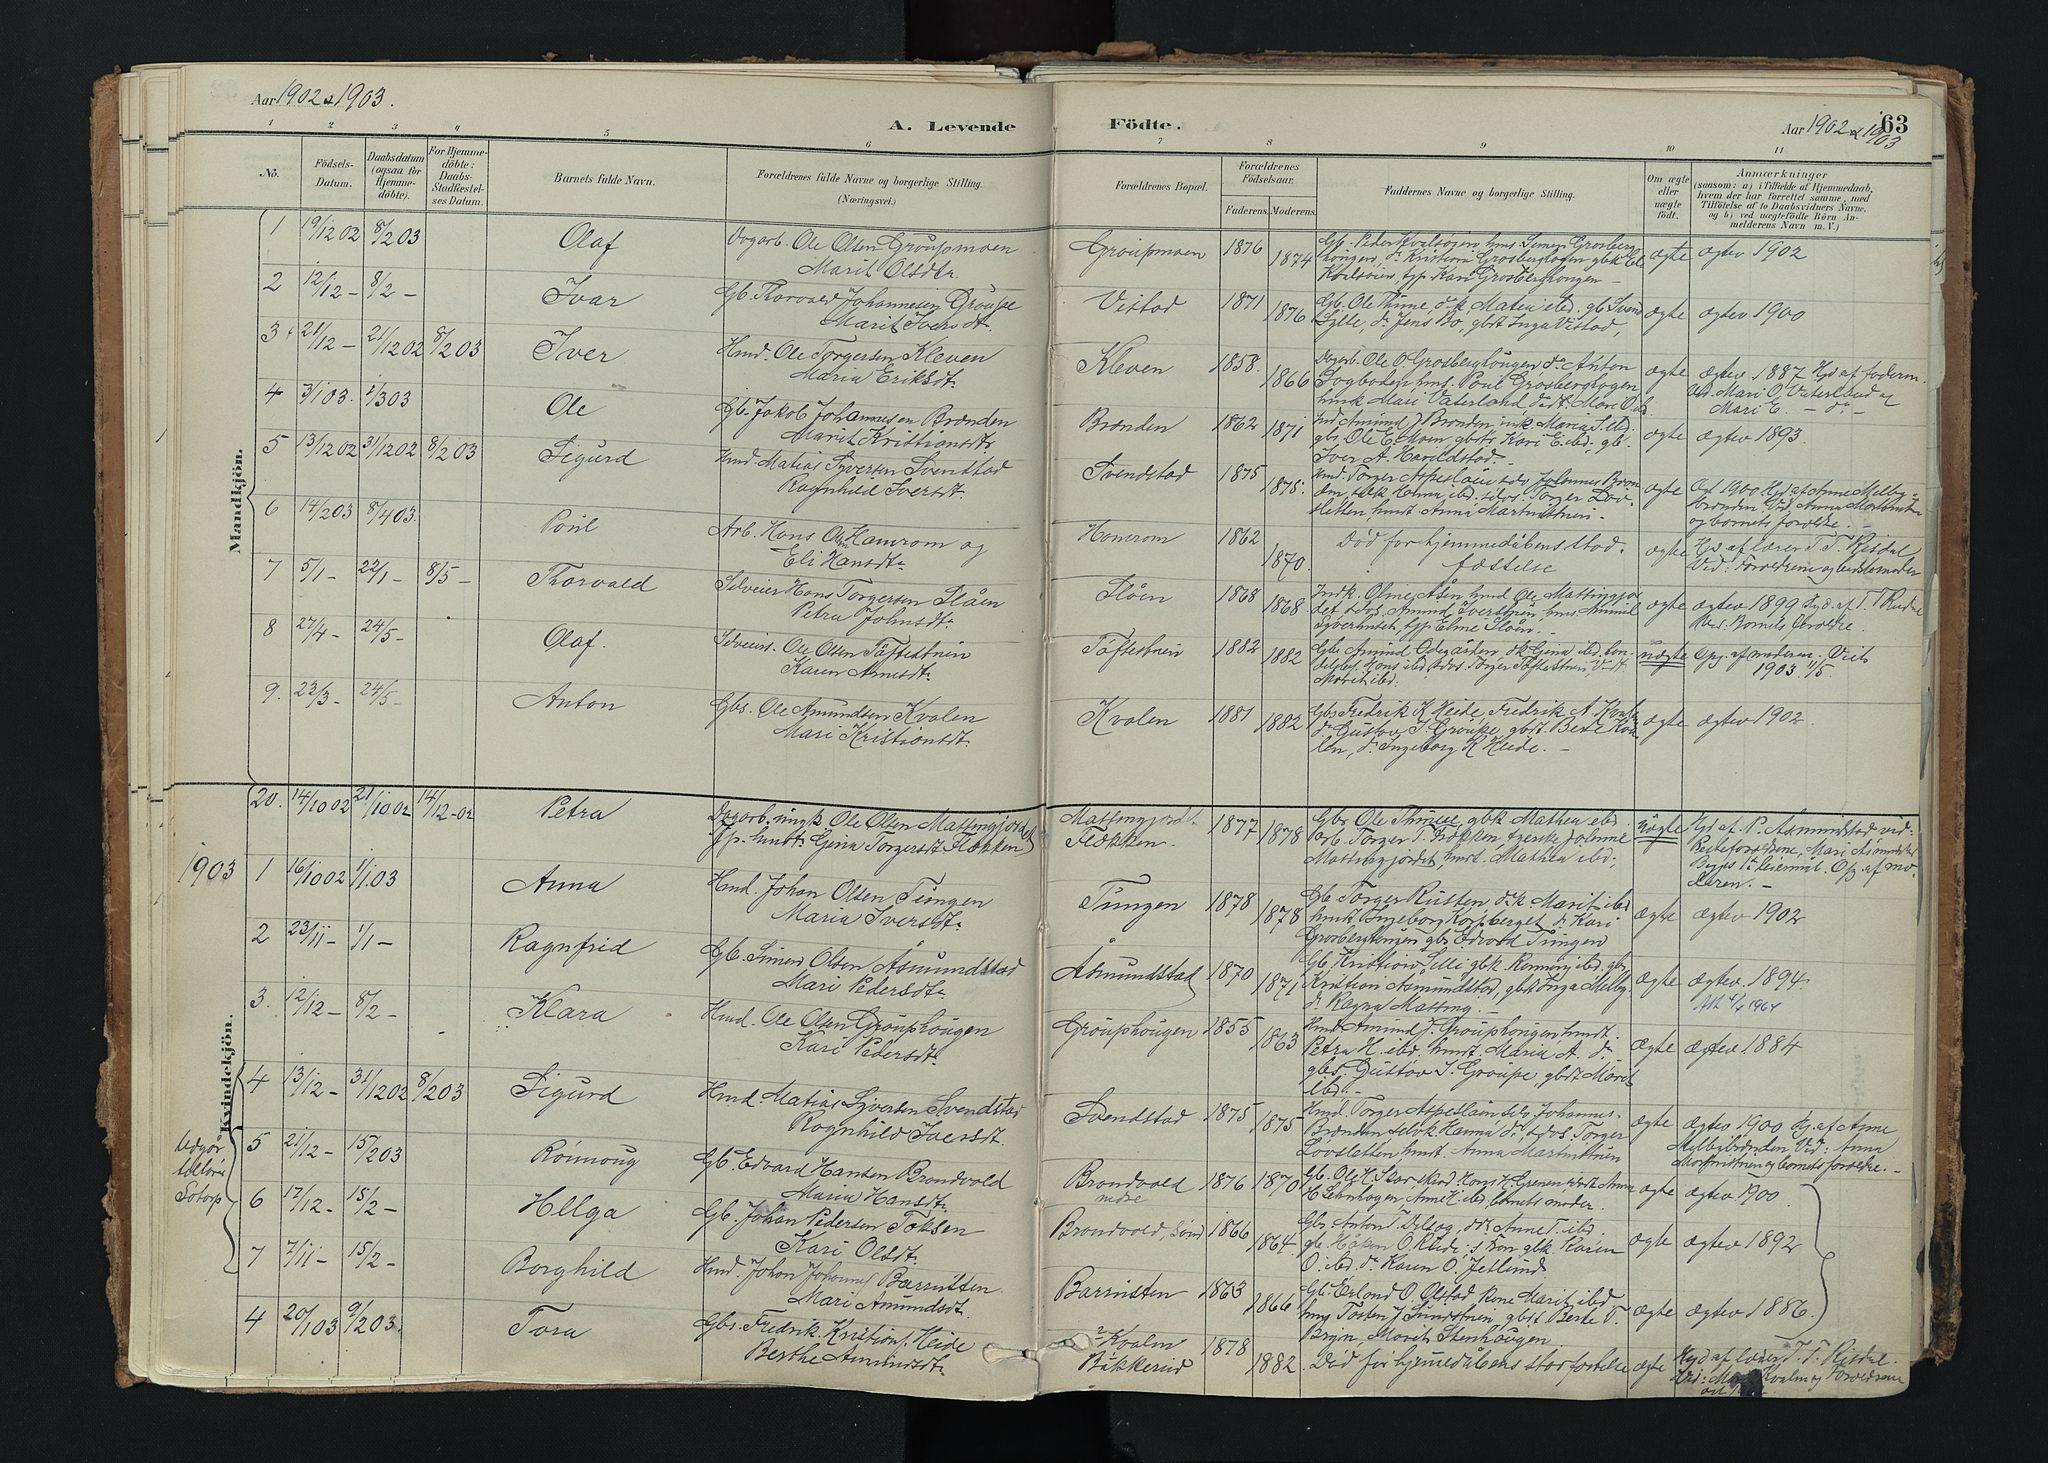 SAH, Nord-Fron prestekontor, Ministerialbok nr. 5, 1884-1914, s. 63